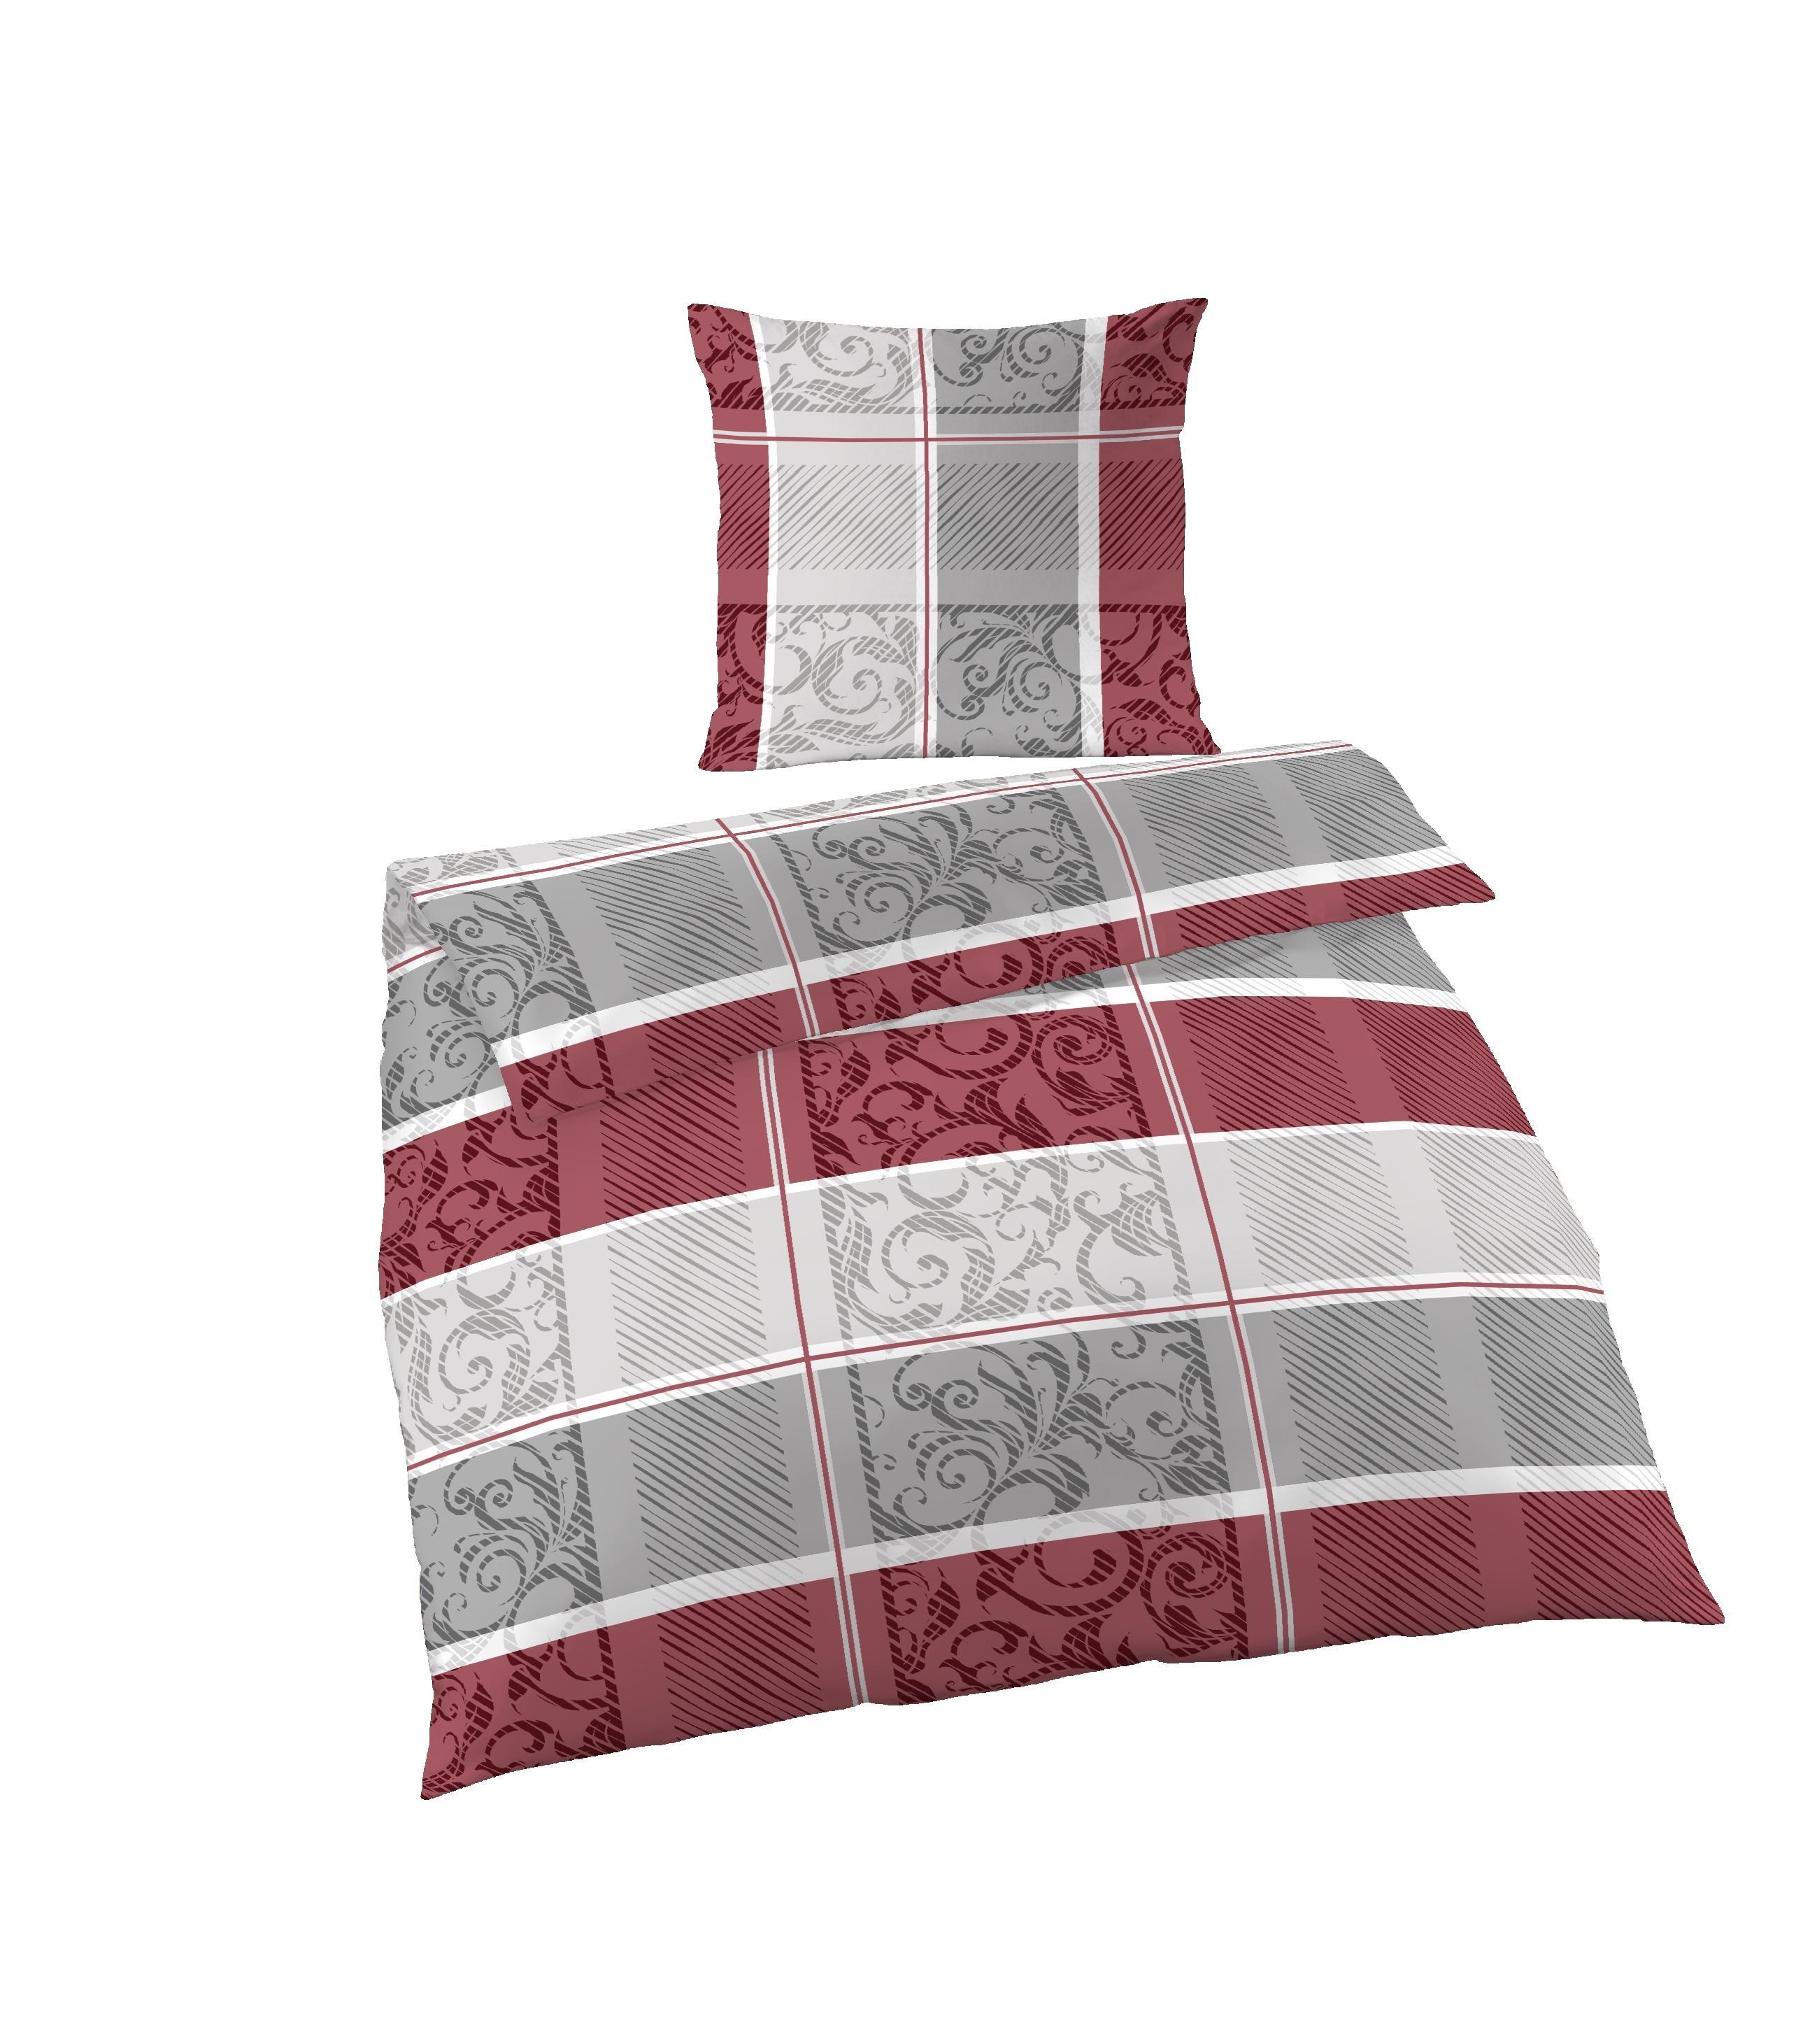 2 tlg bettw sche 135 x 200 cm grau rot fein biber baumwolle garnitur bettw sche baumwolle 135x200 cm. Black Bedroom Furniture Sets. Home Design Ideas